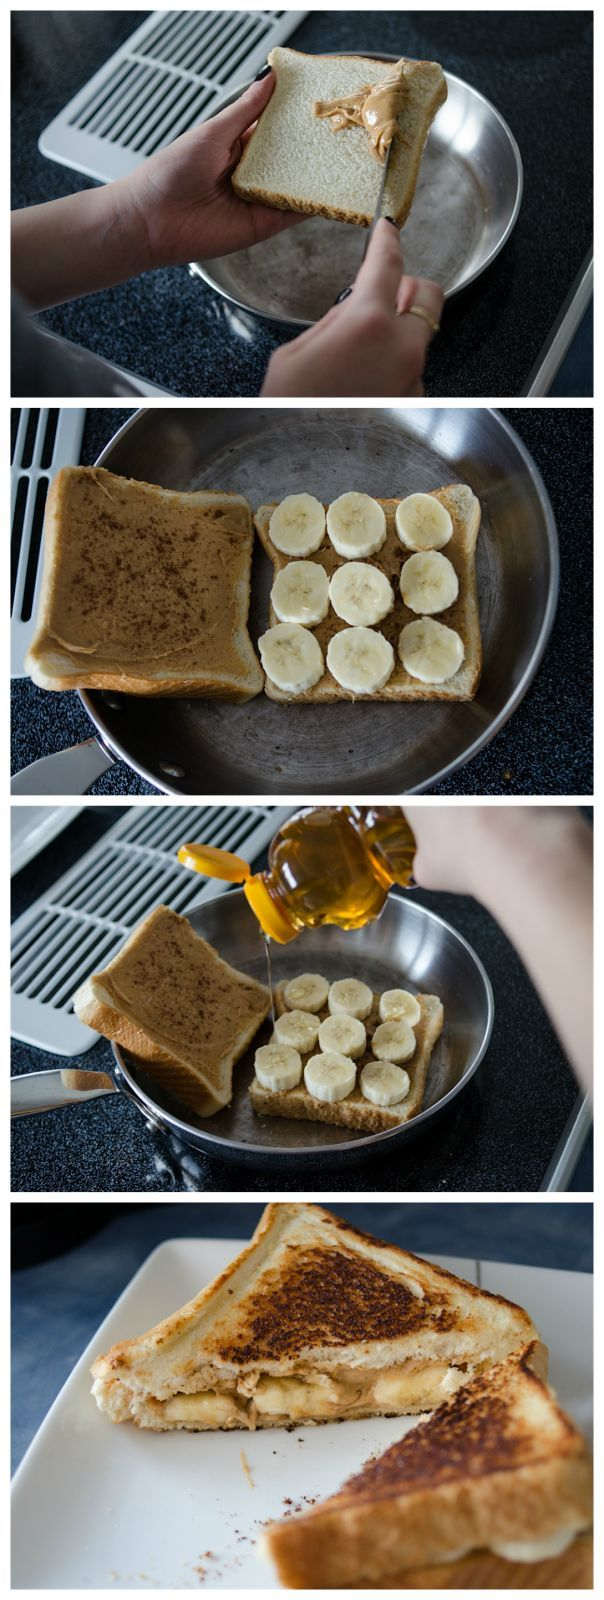 Banana, Cinnamon | CookJino